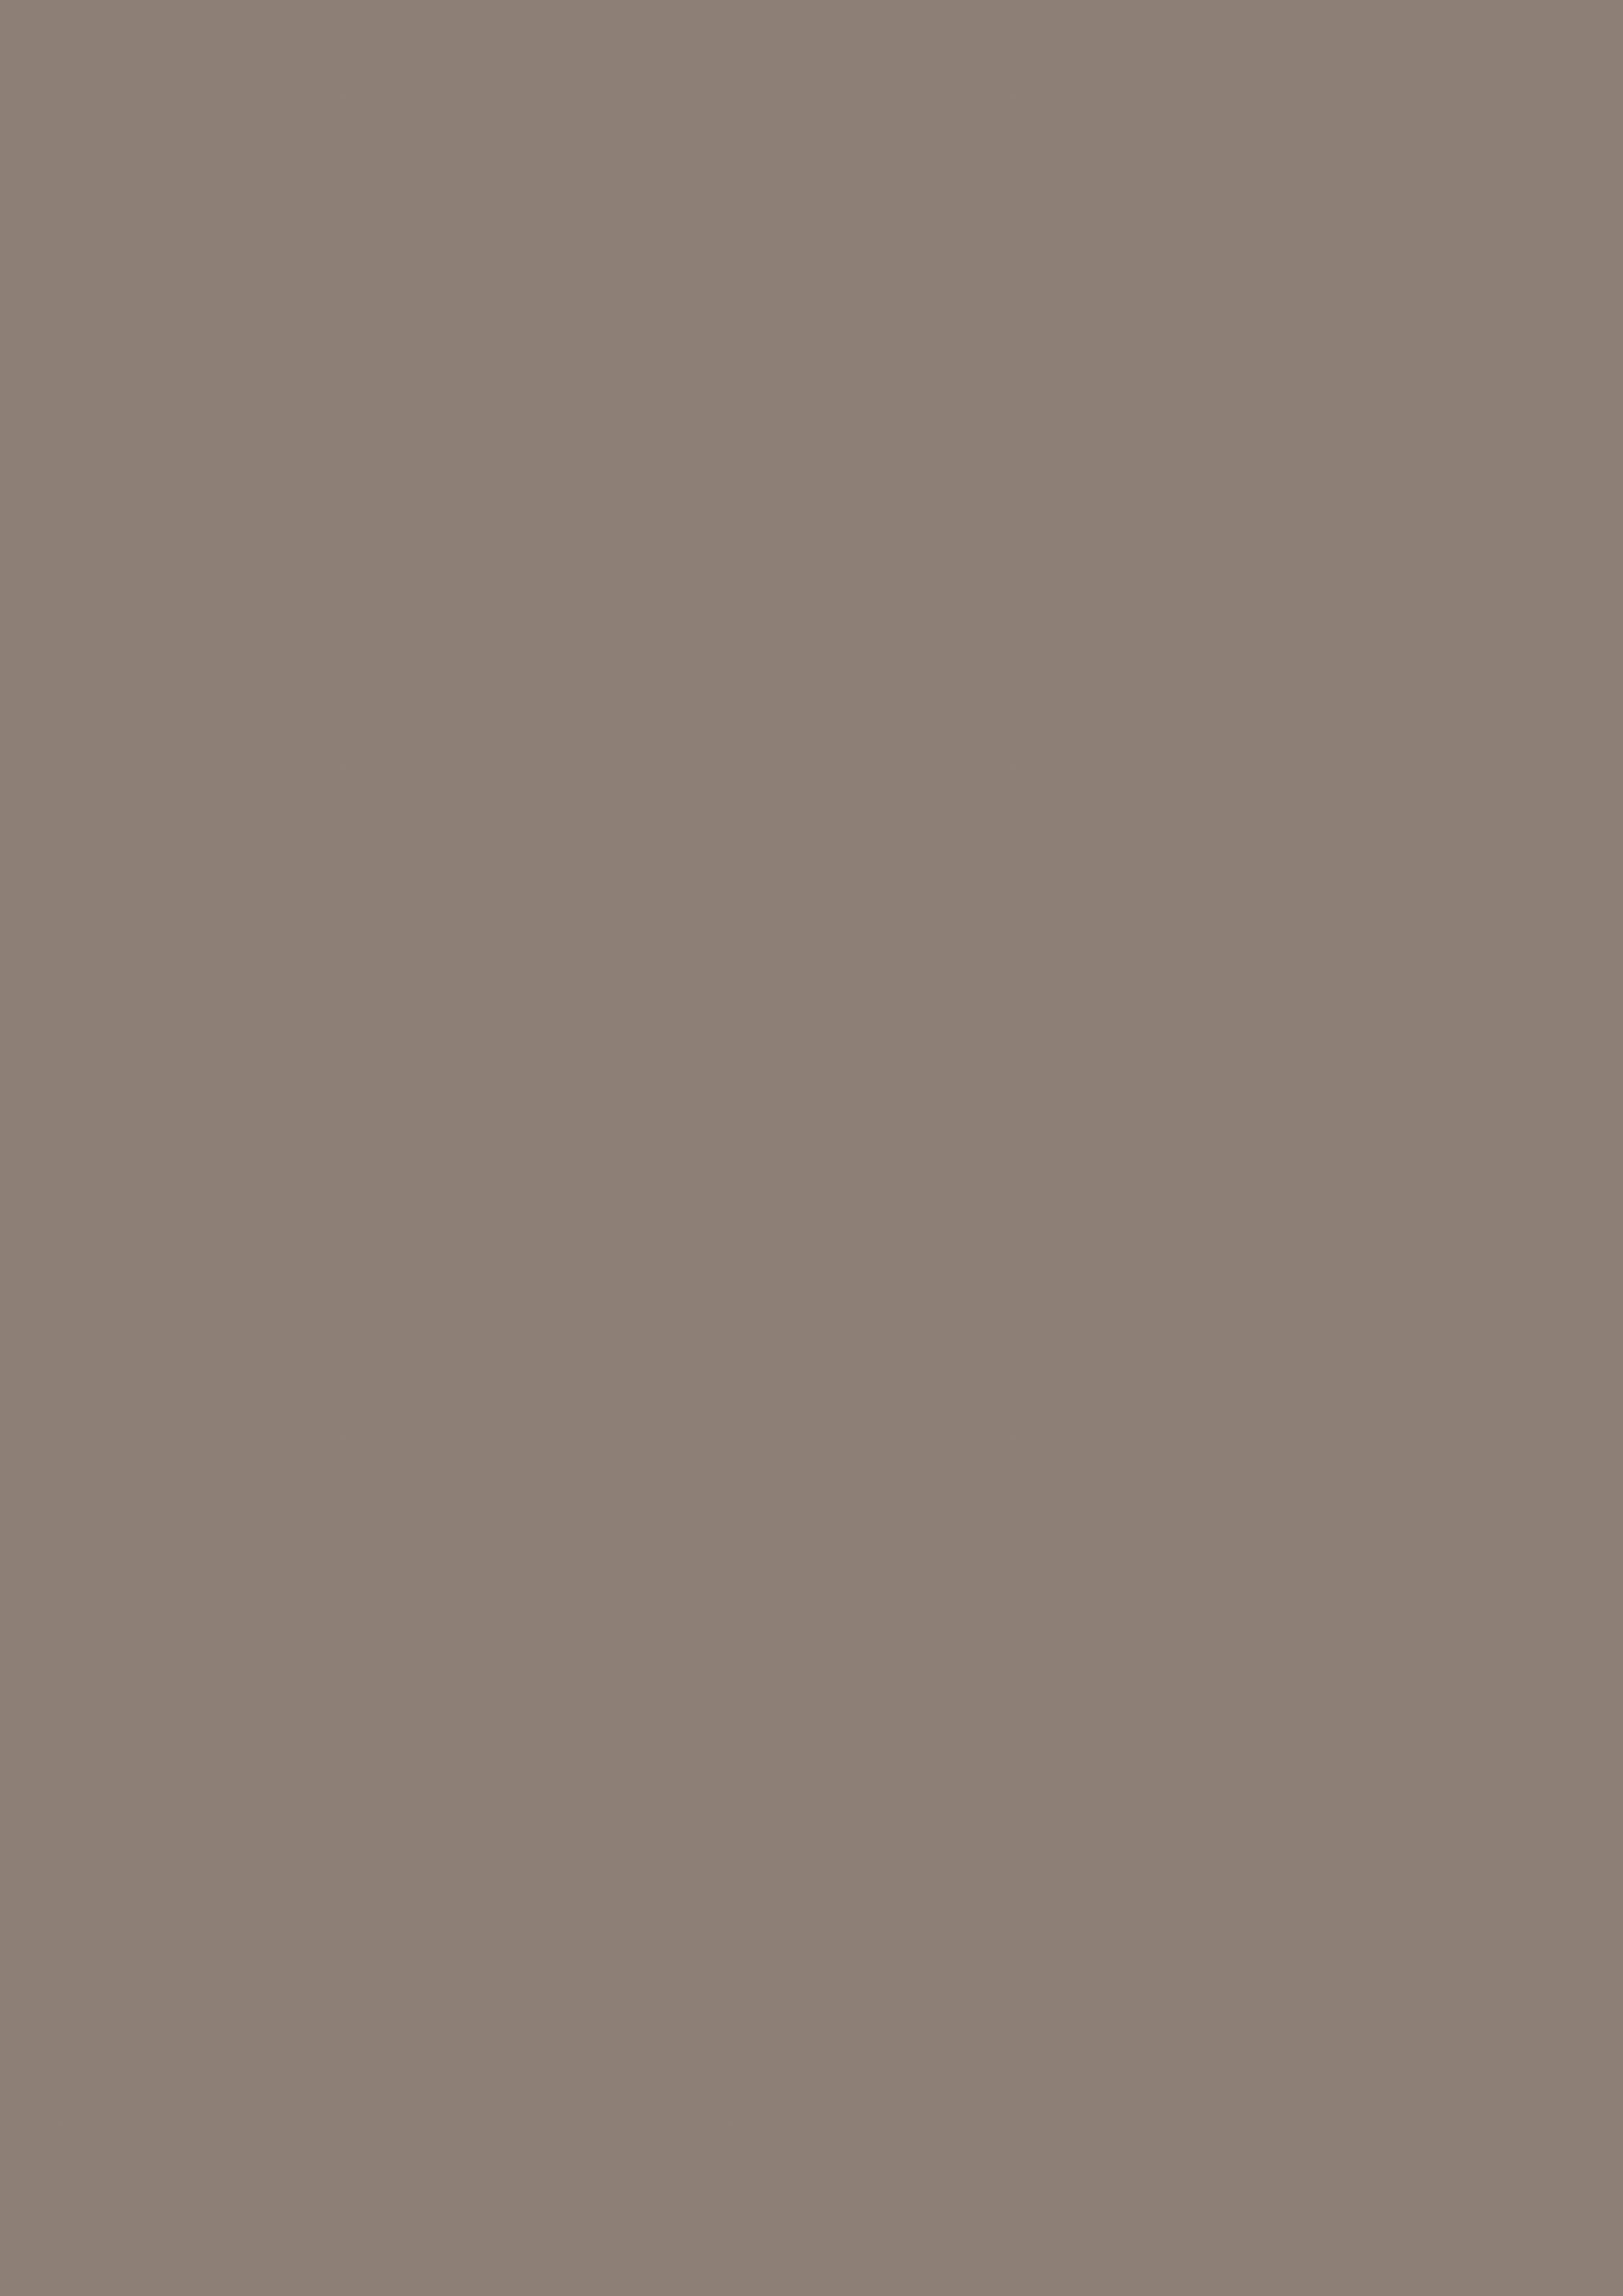 Truffel gray (U1102FG)